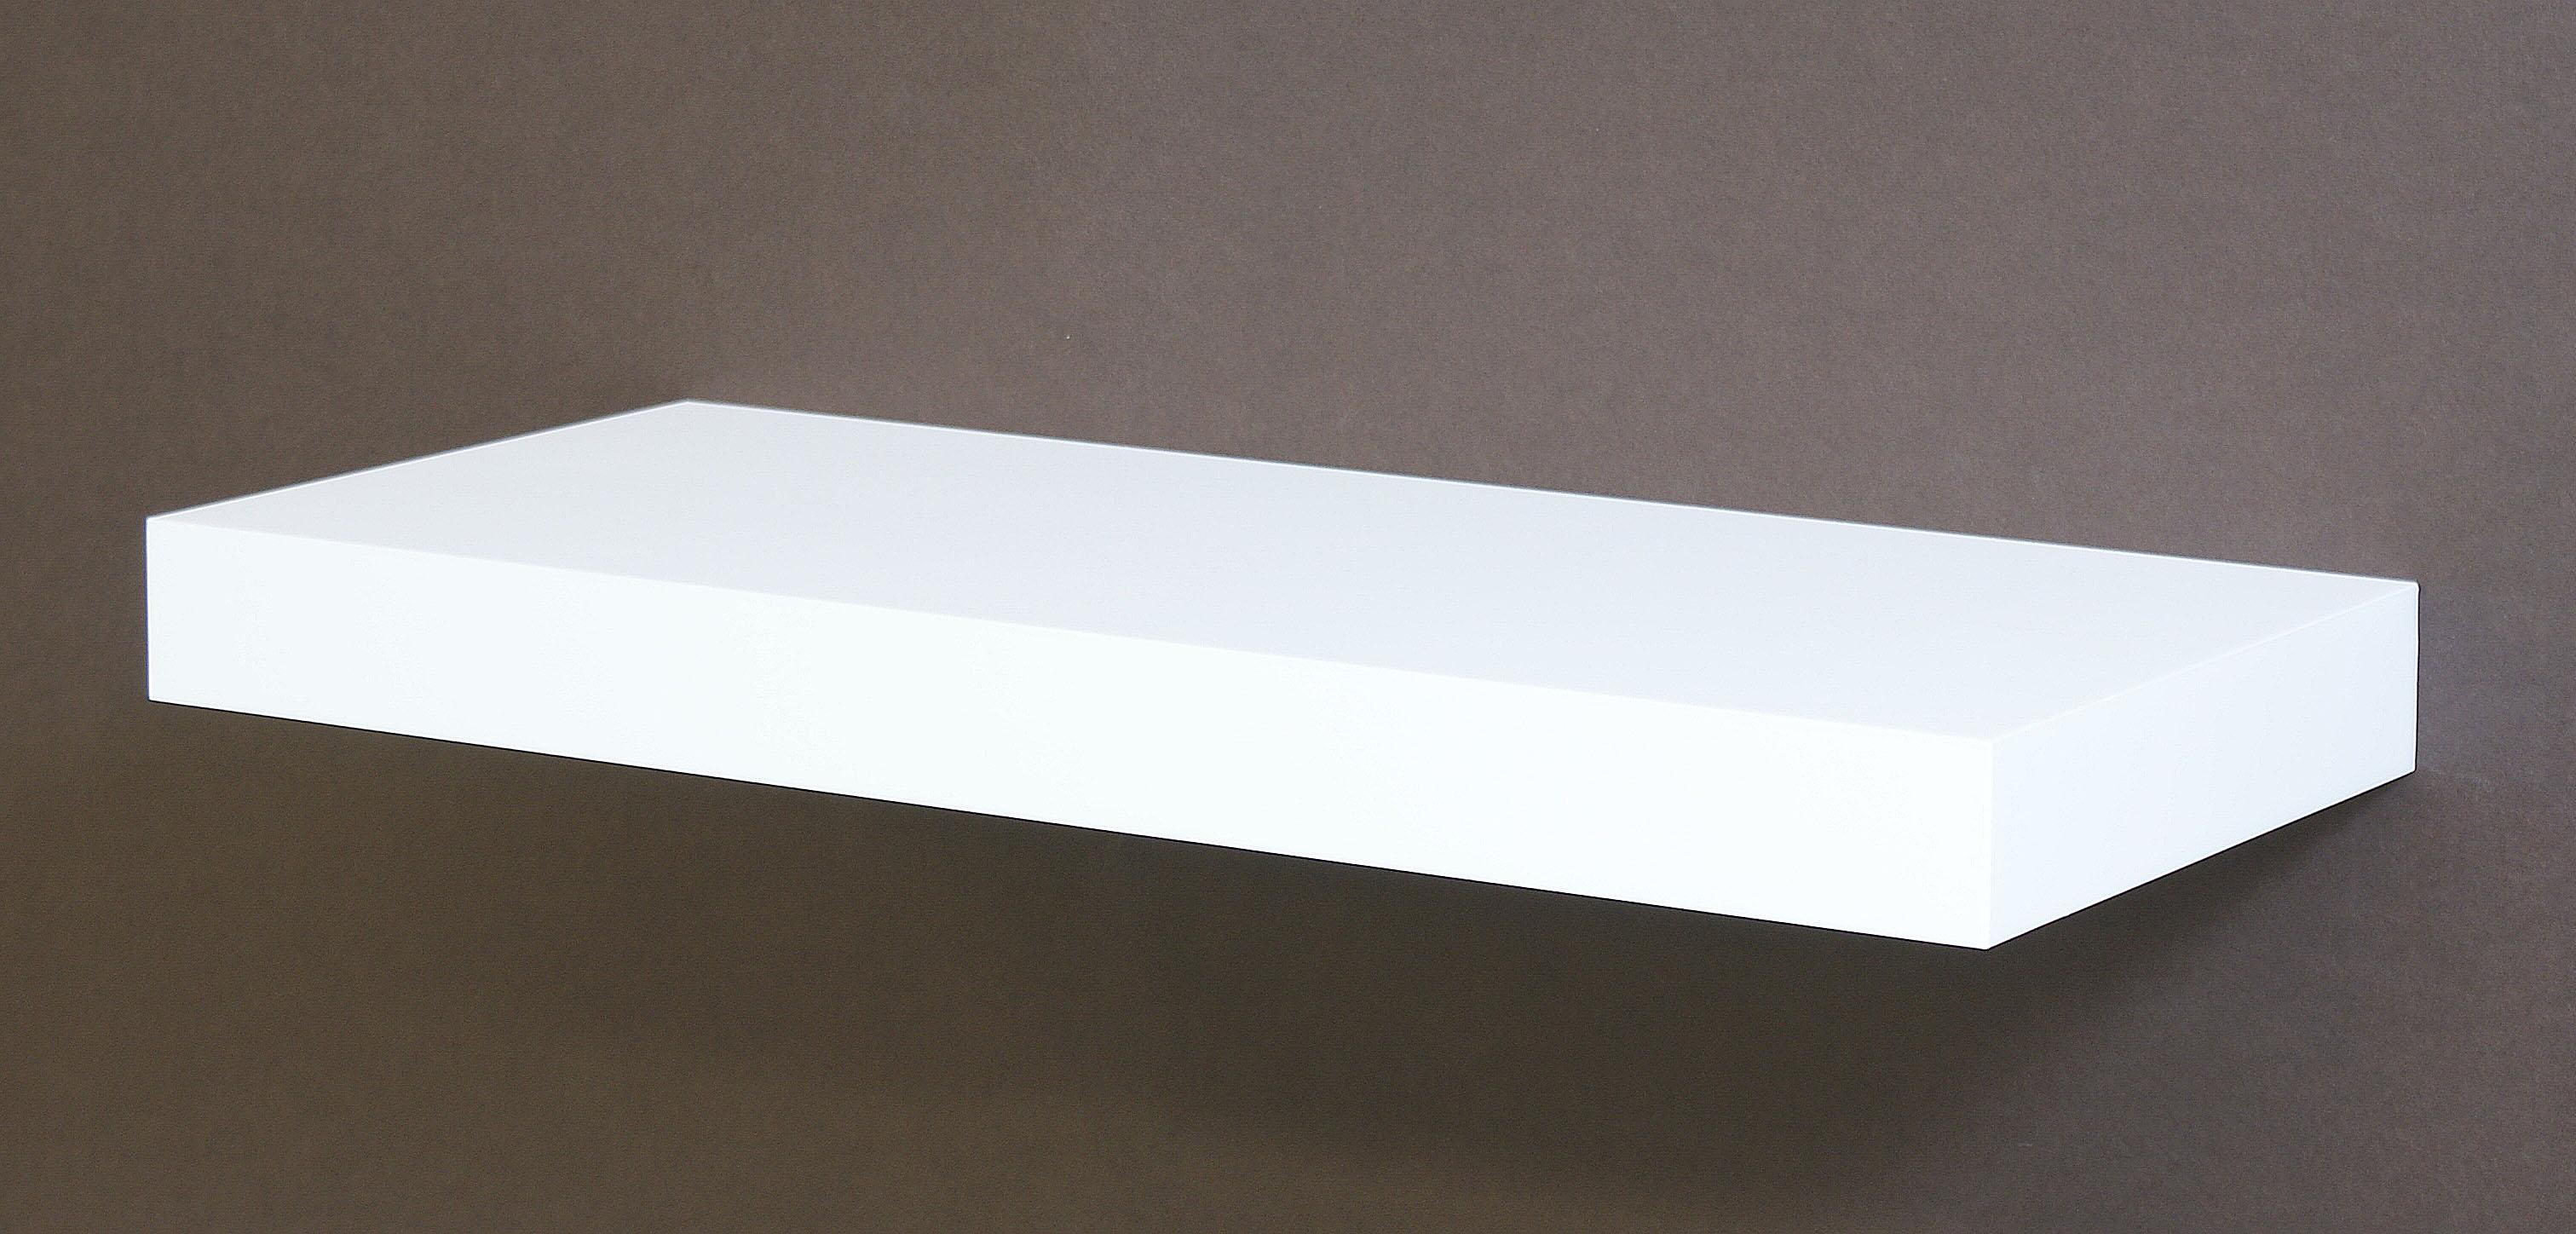 White Floating Shelf Kit 570x300x50mm Mastershelf